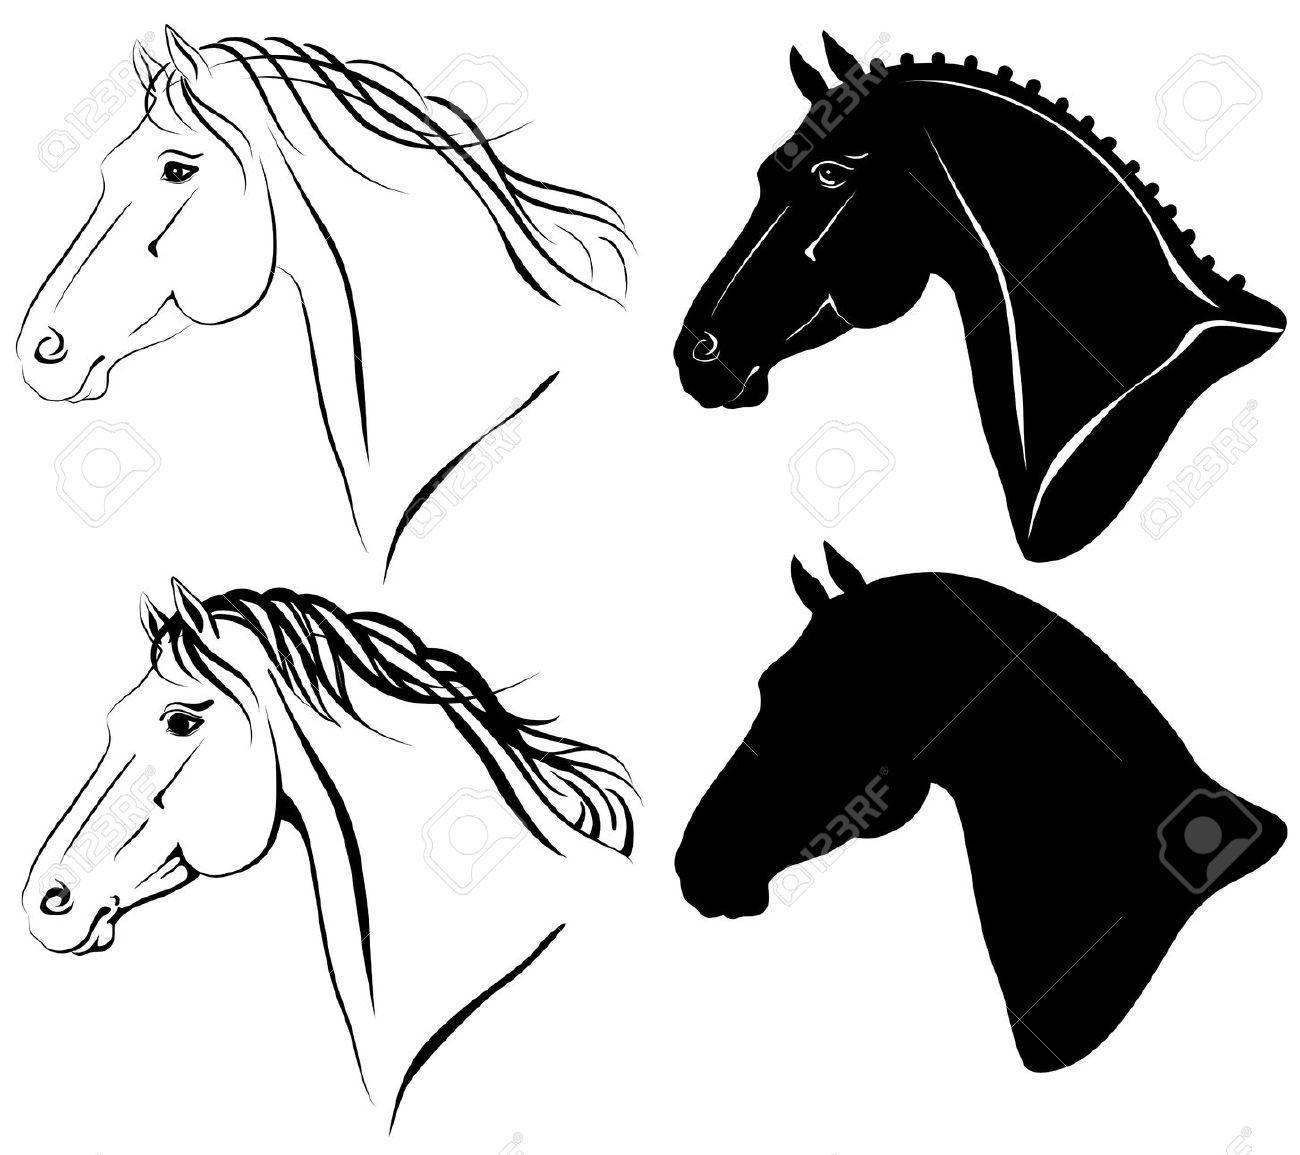 Horses head clipart - Clipground